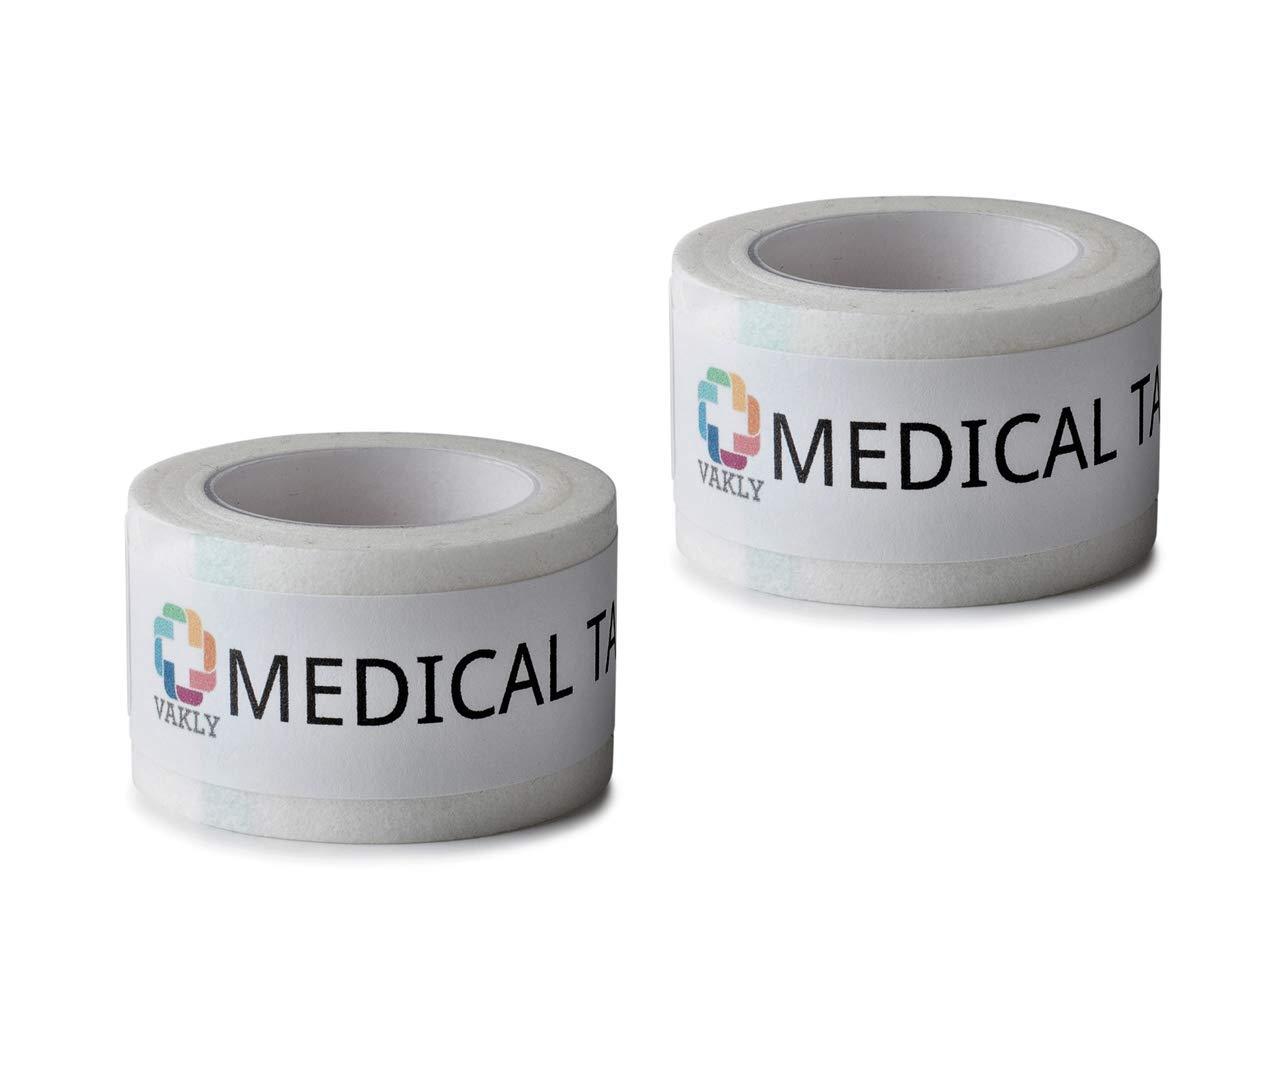 24 Conforming Stretch Gauze Rolls 4''x4.1 Yards - Plus 2 Rolls of Vakly Medical Tape